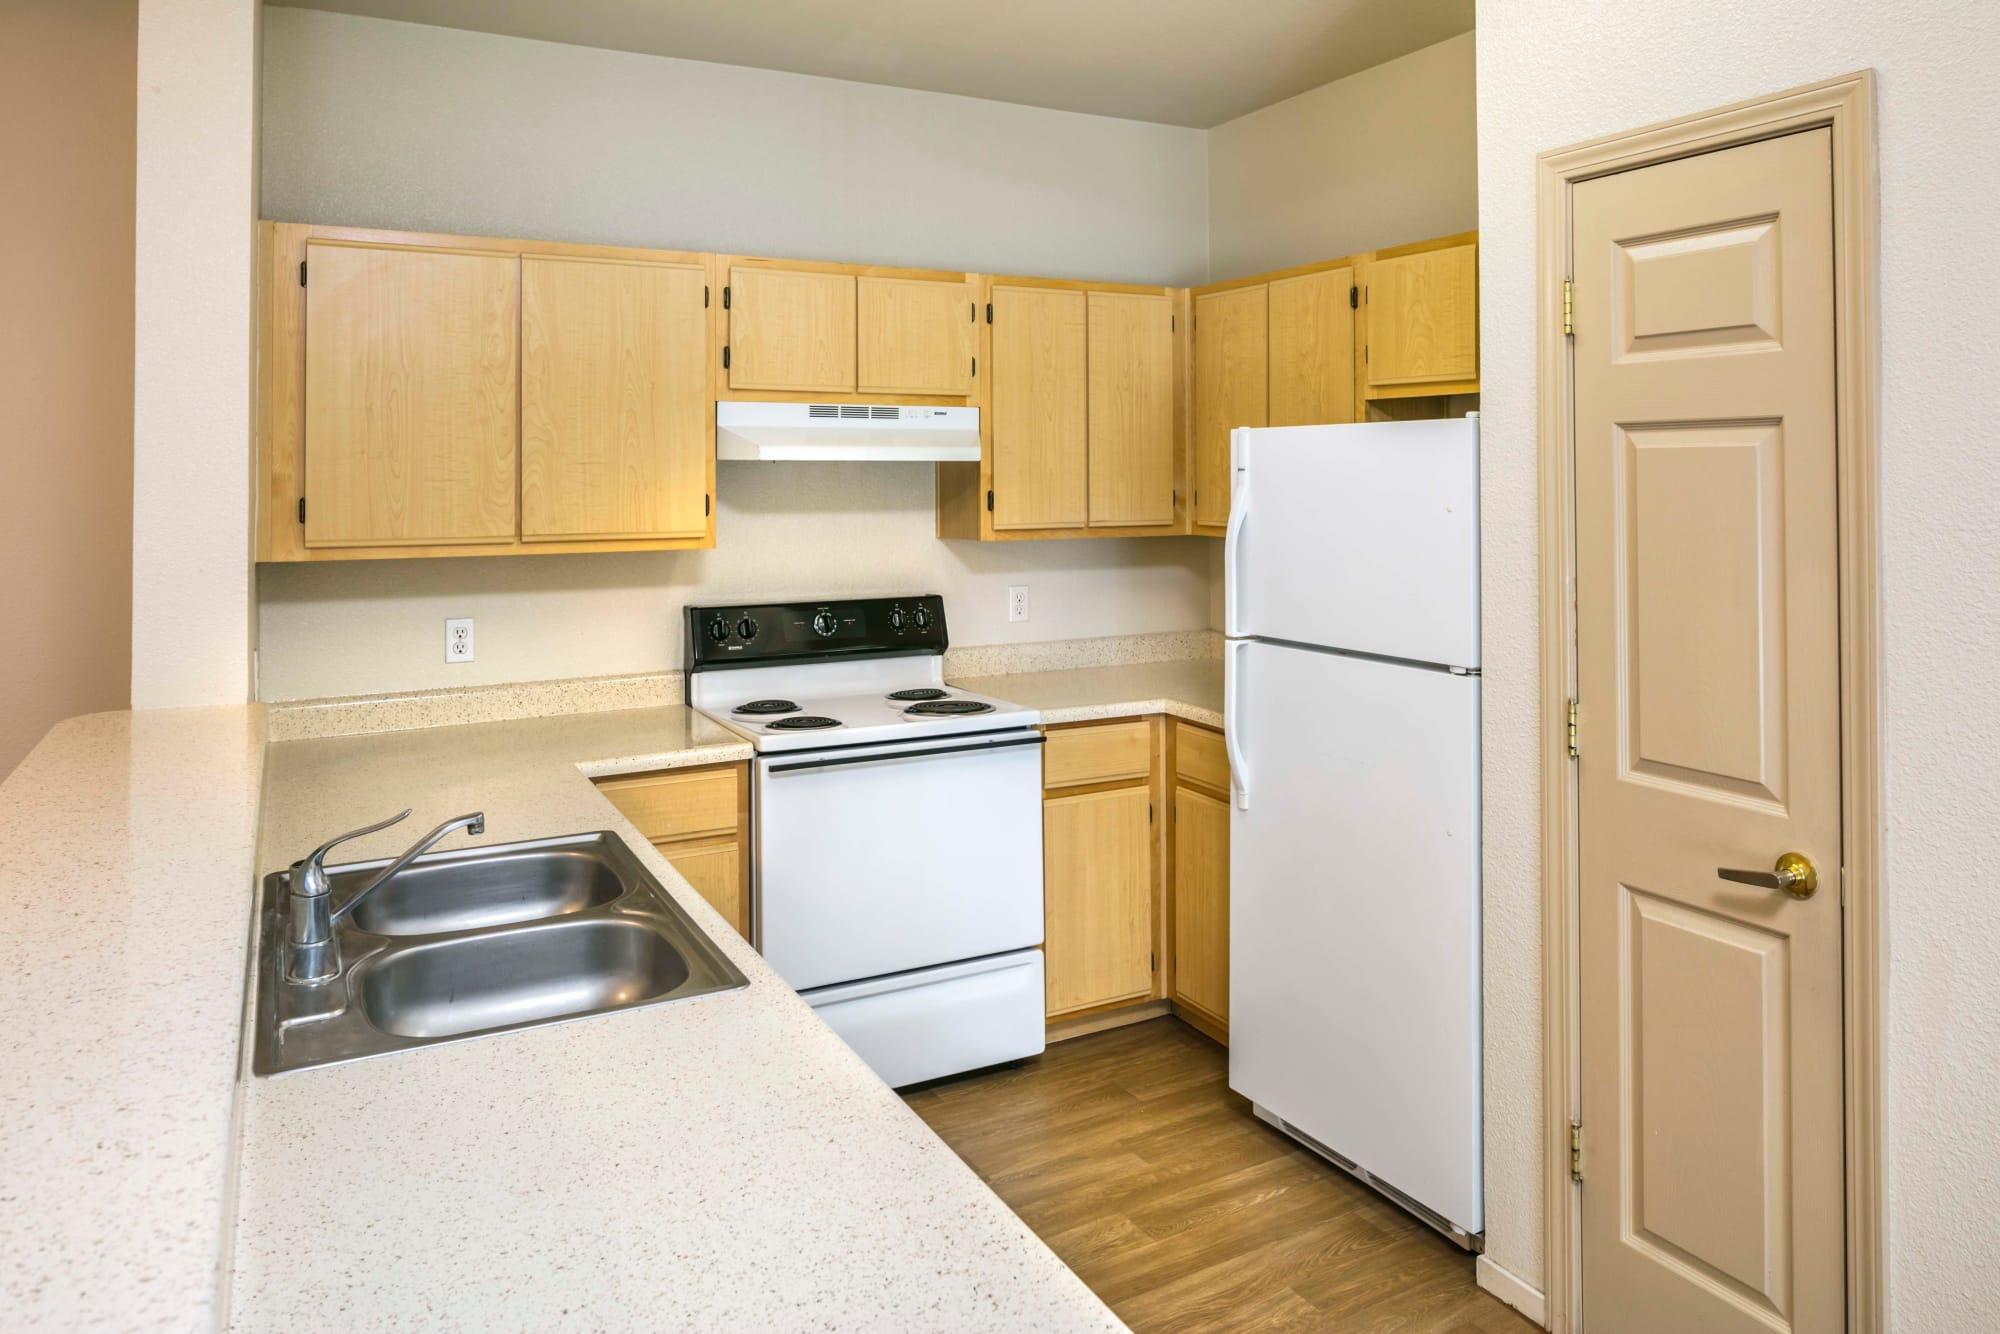 A full kitchen at Natomas Park Apartments in Sacramento, California